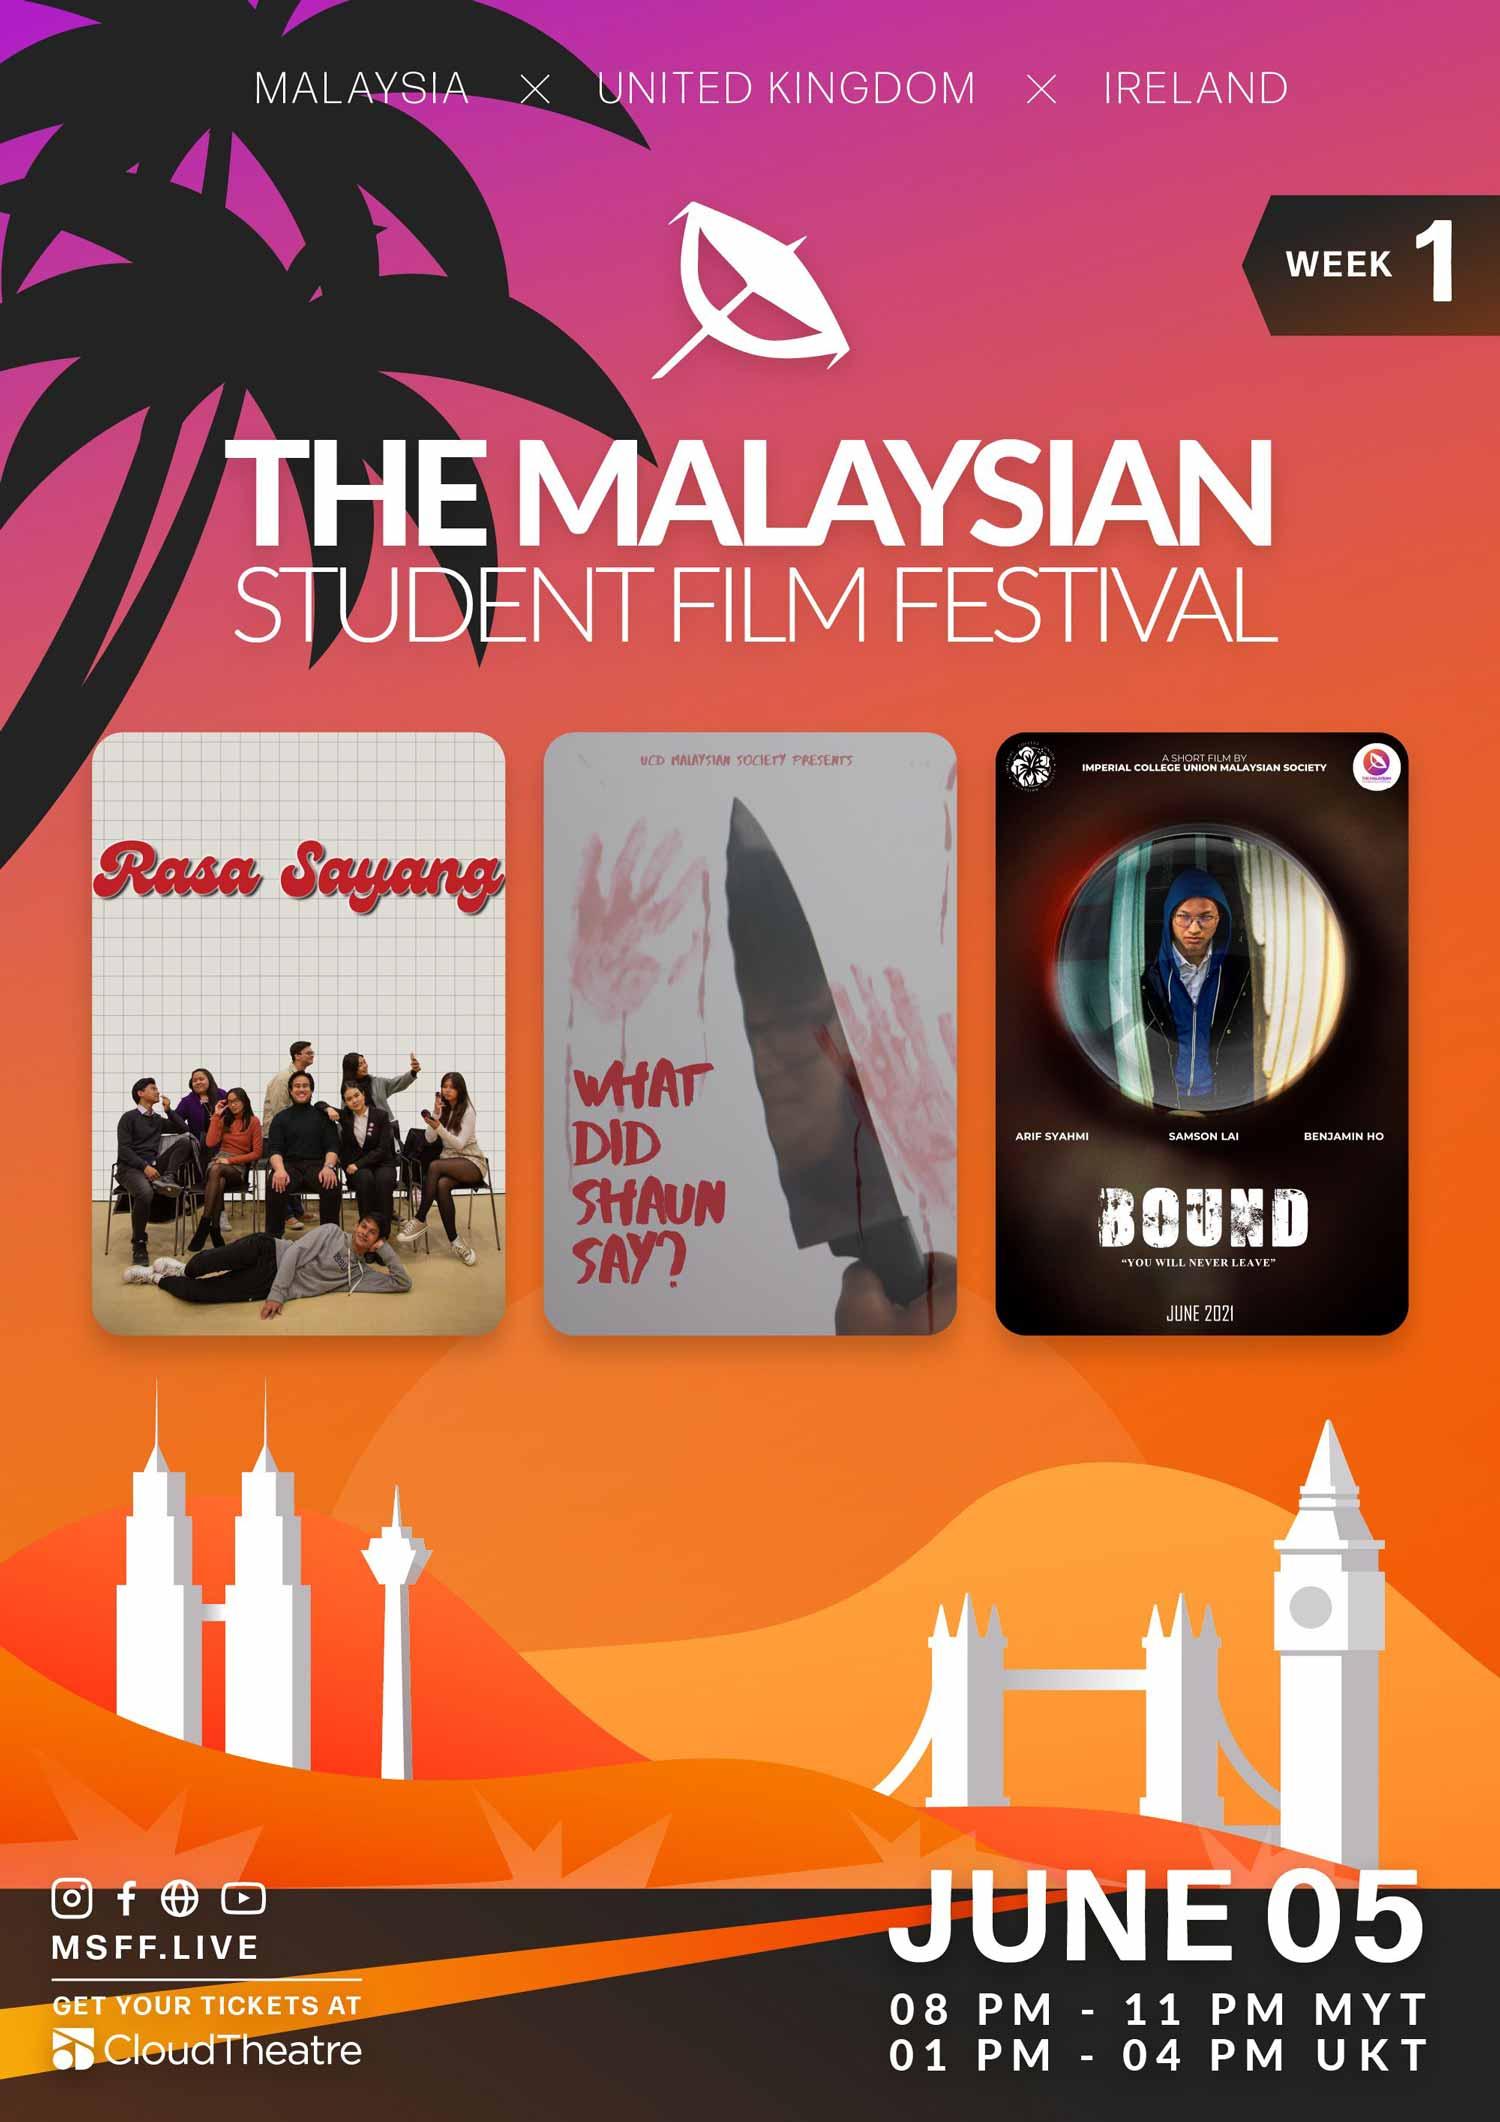 Week 1: Malaysian Student Film Festival